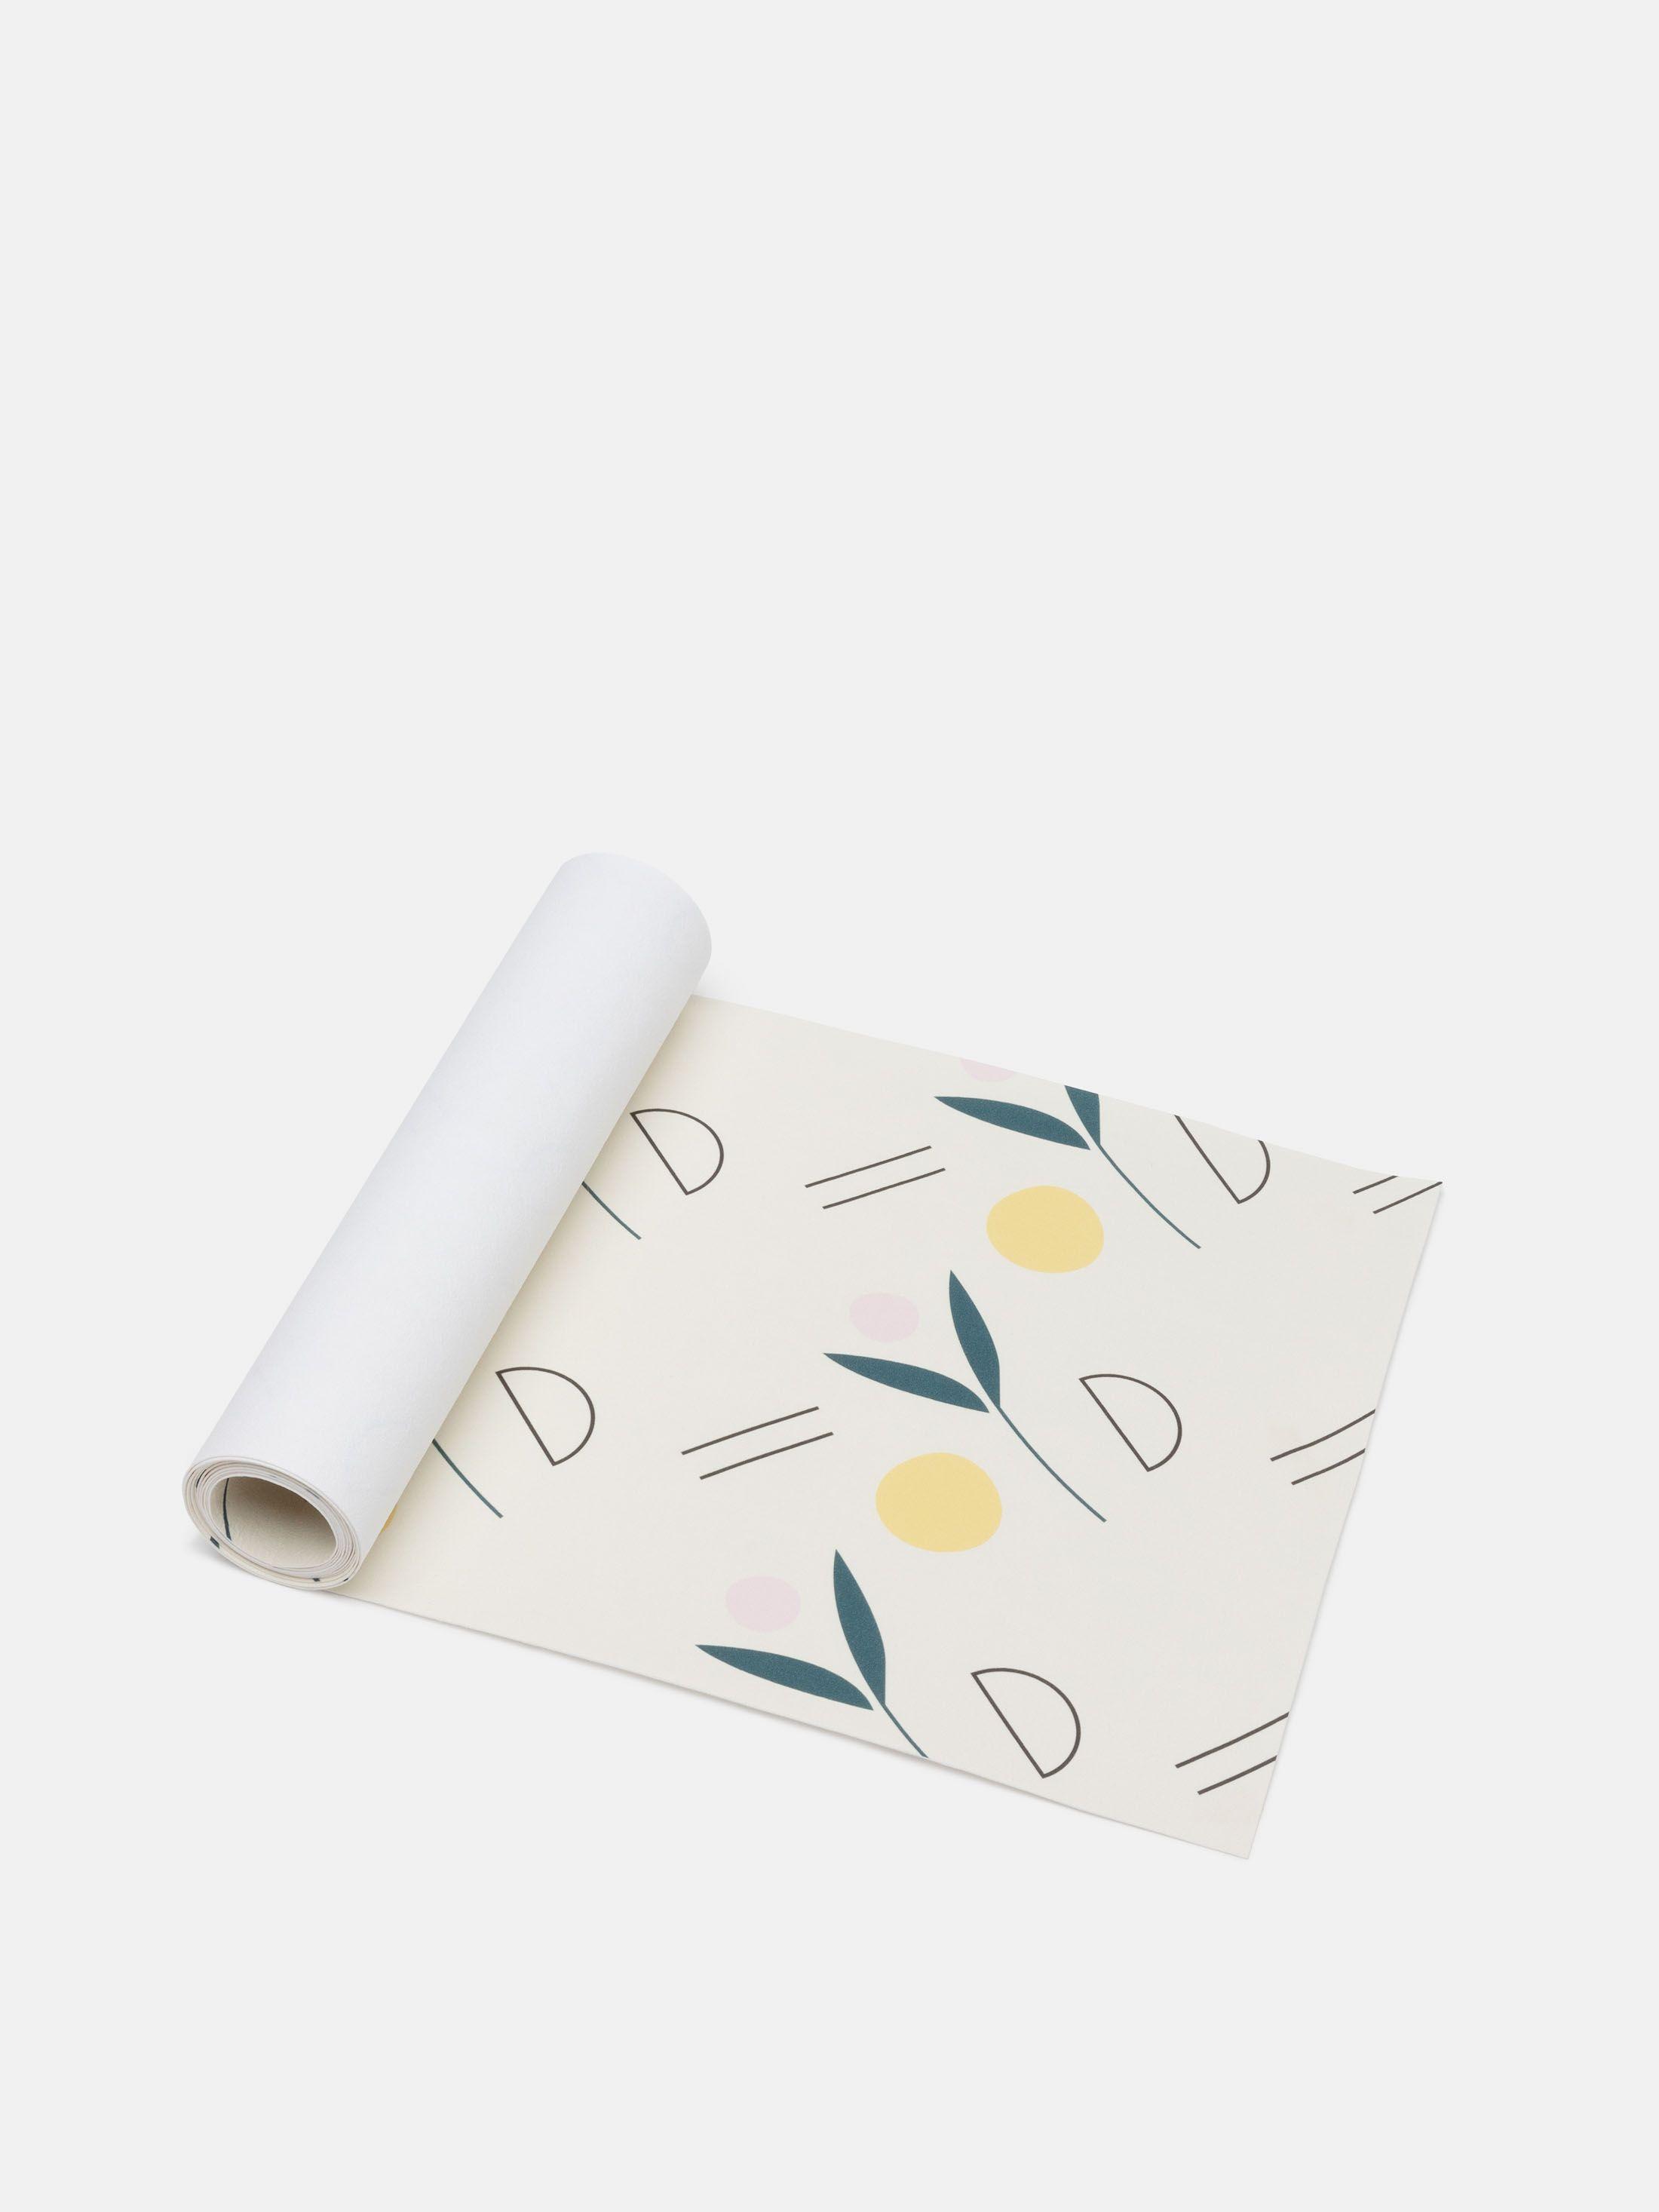 printed to order wallpaper borders